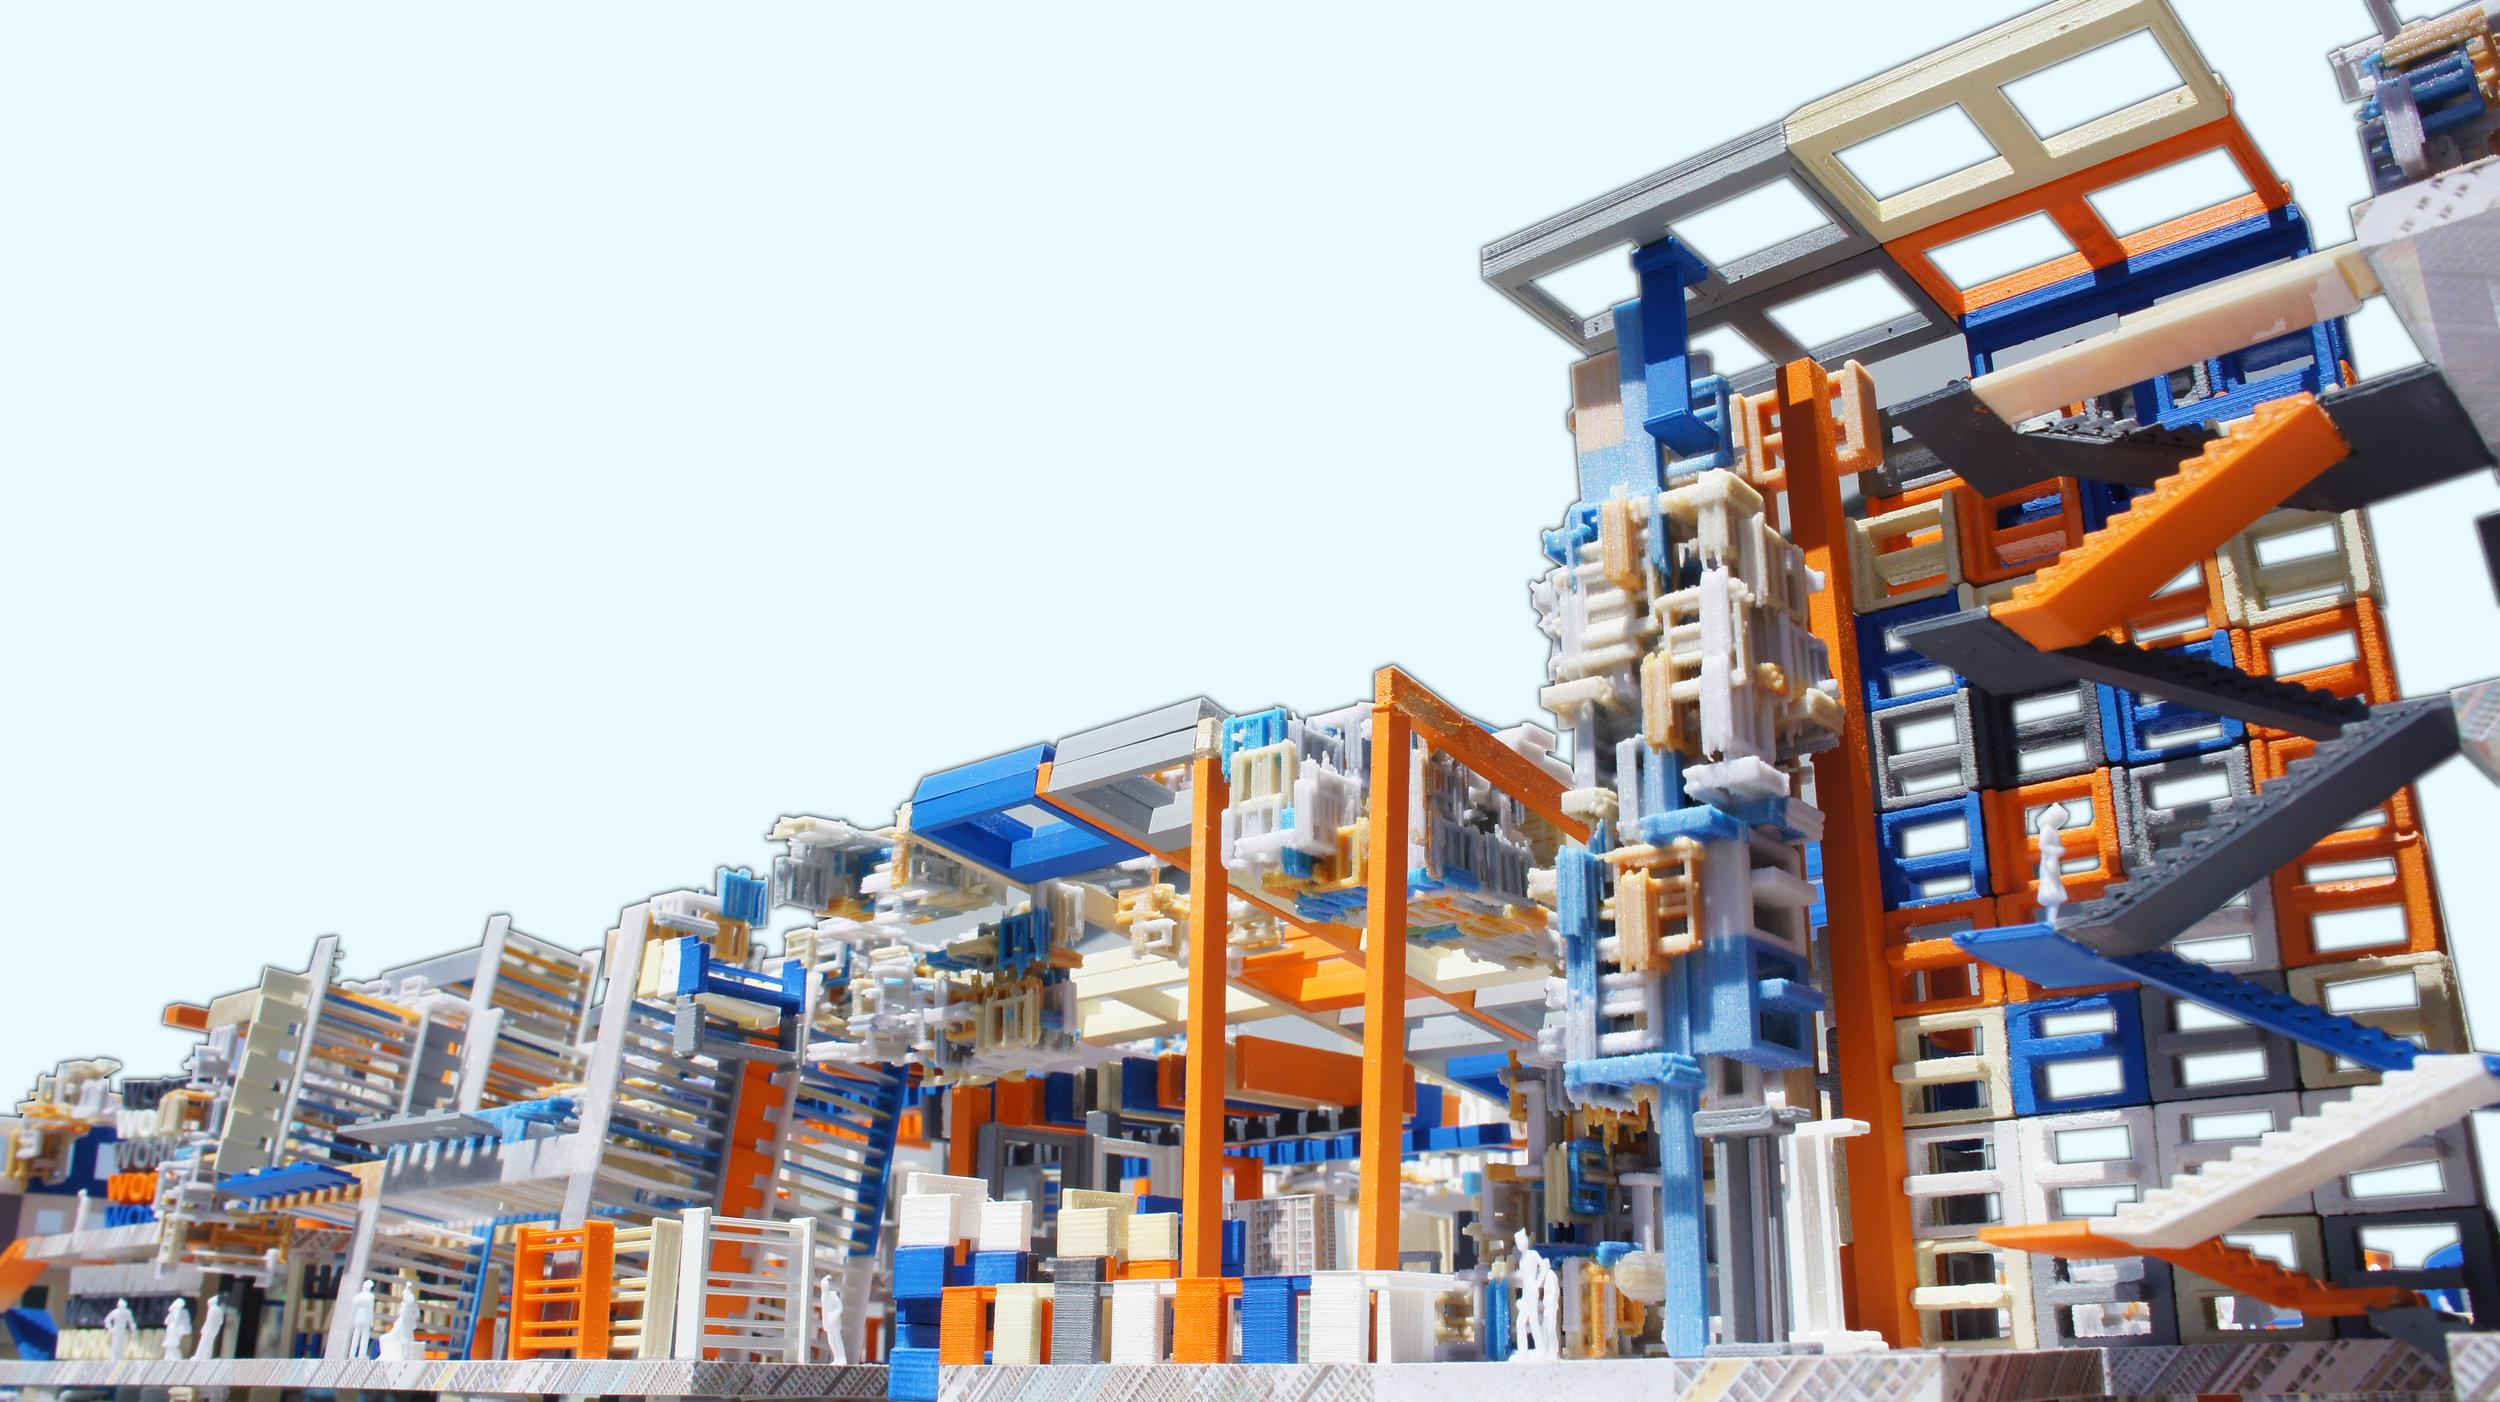 Computing-Embedded Infrasture